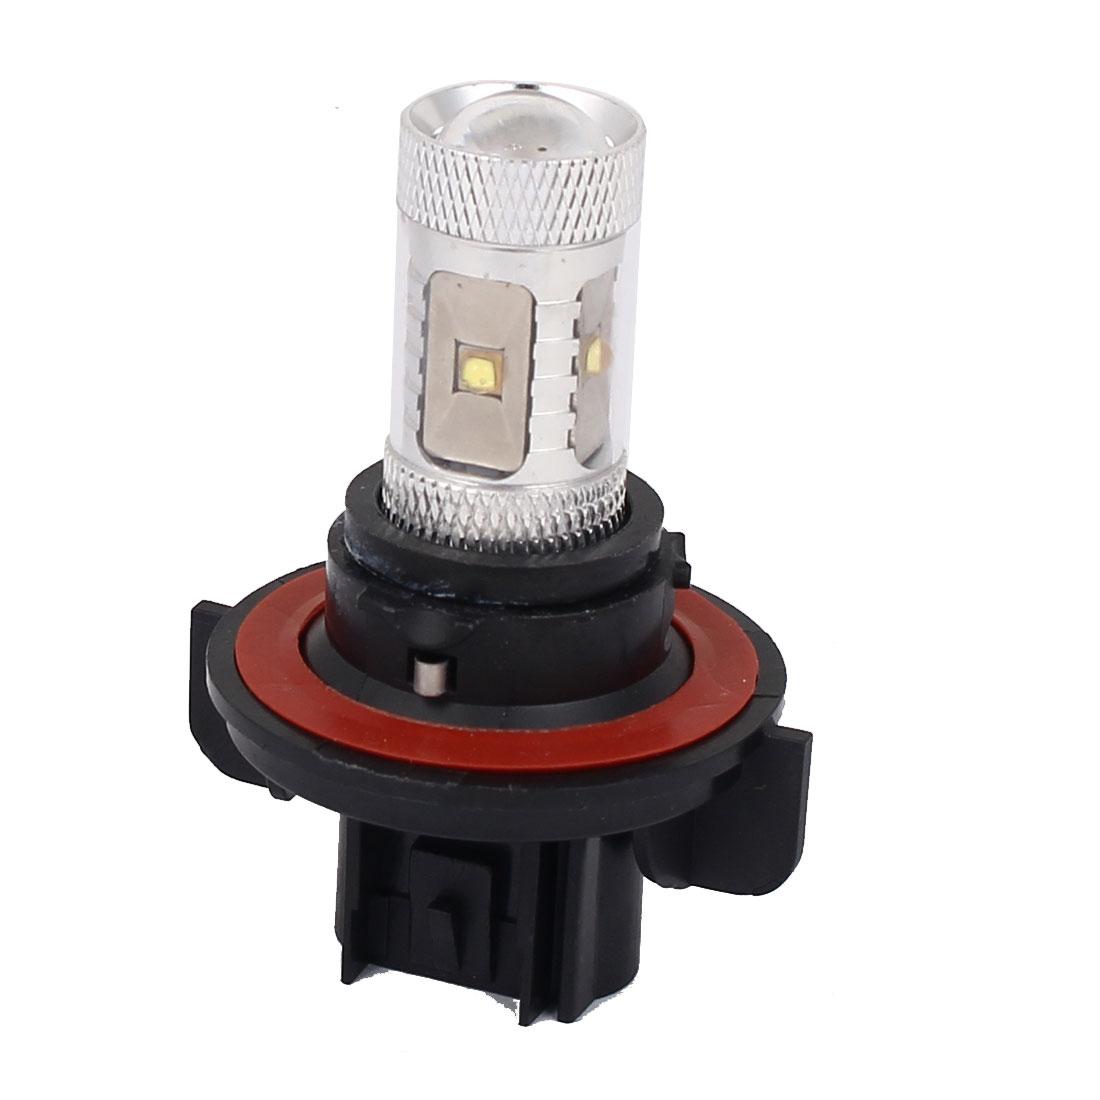 Car Auto H13 White 6 LED Projector Headlight Fog Light Lamp Bulb DC 12V 30W